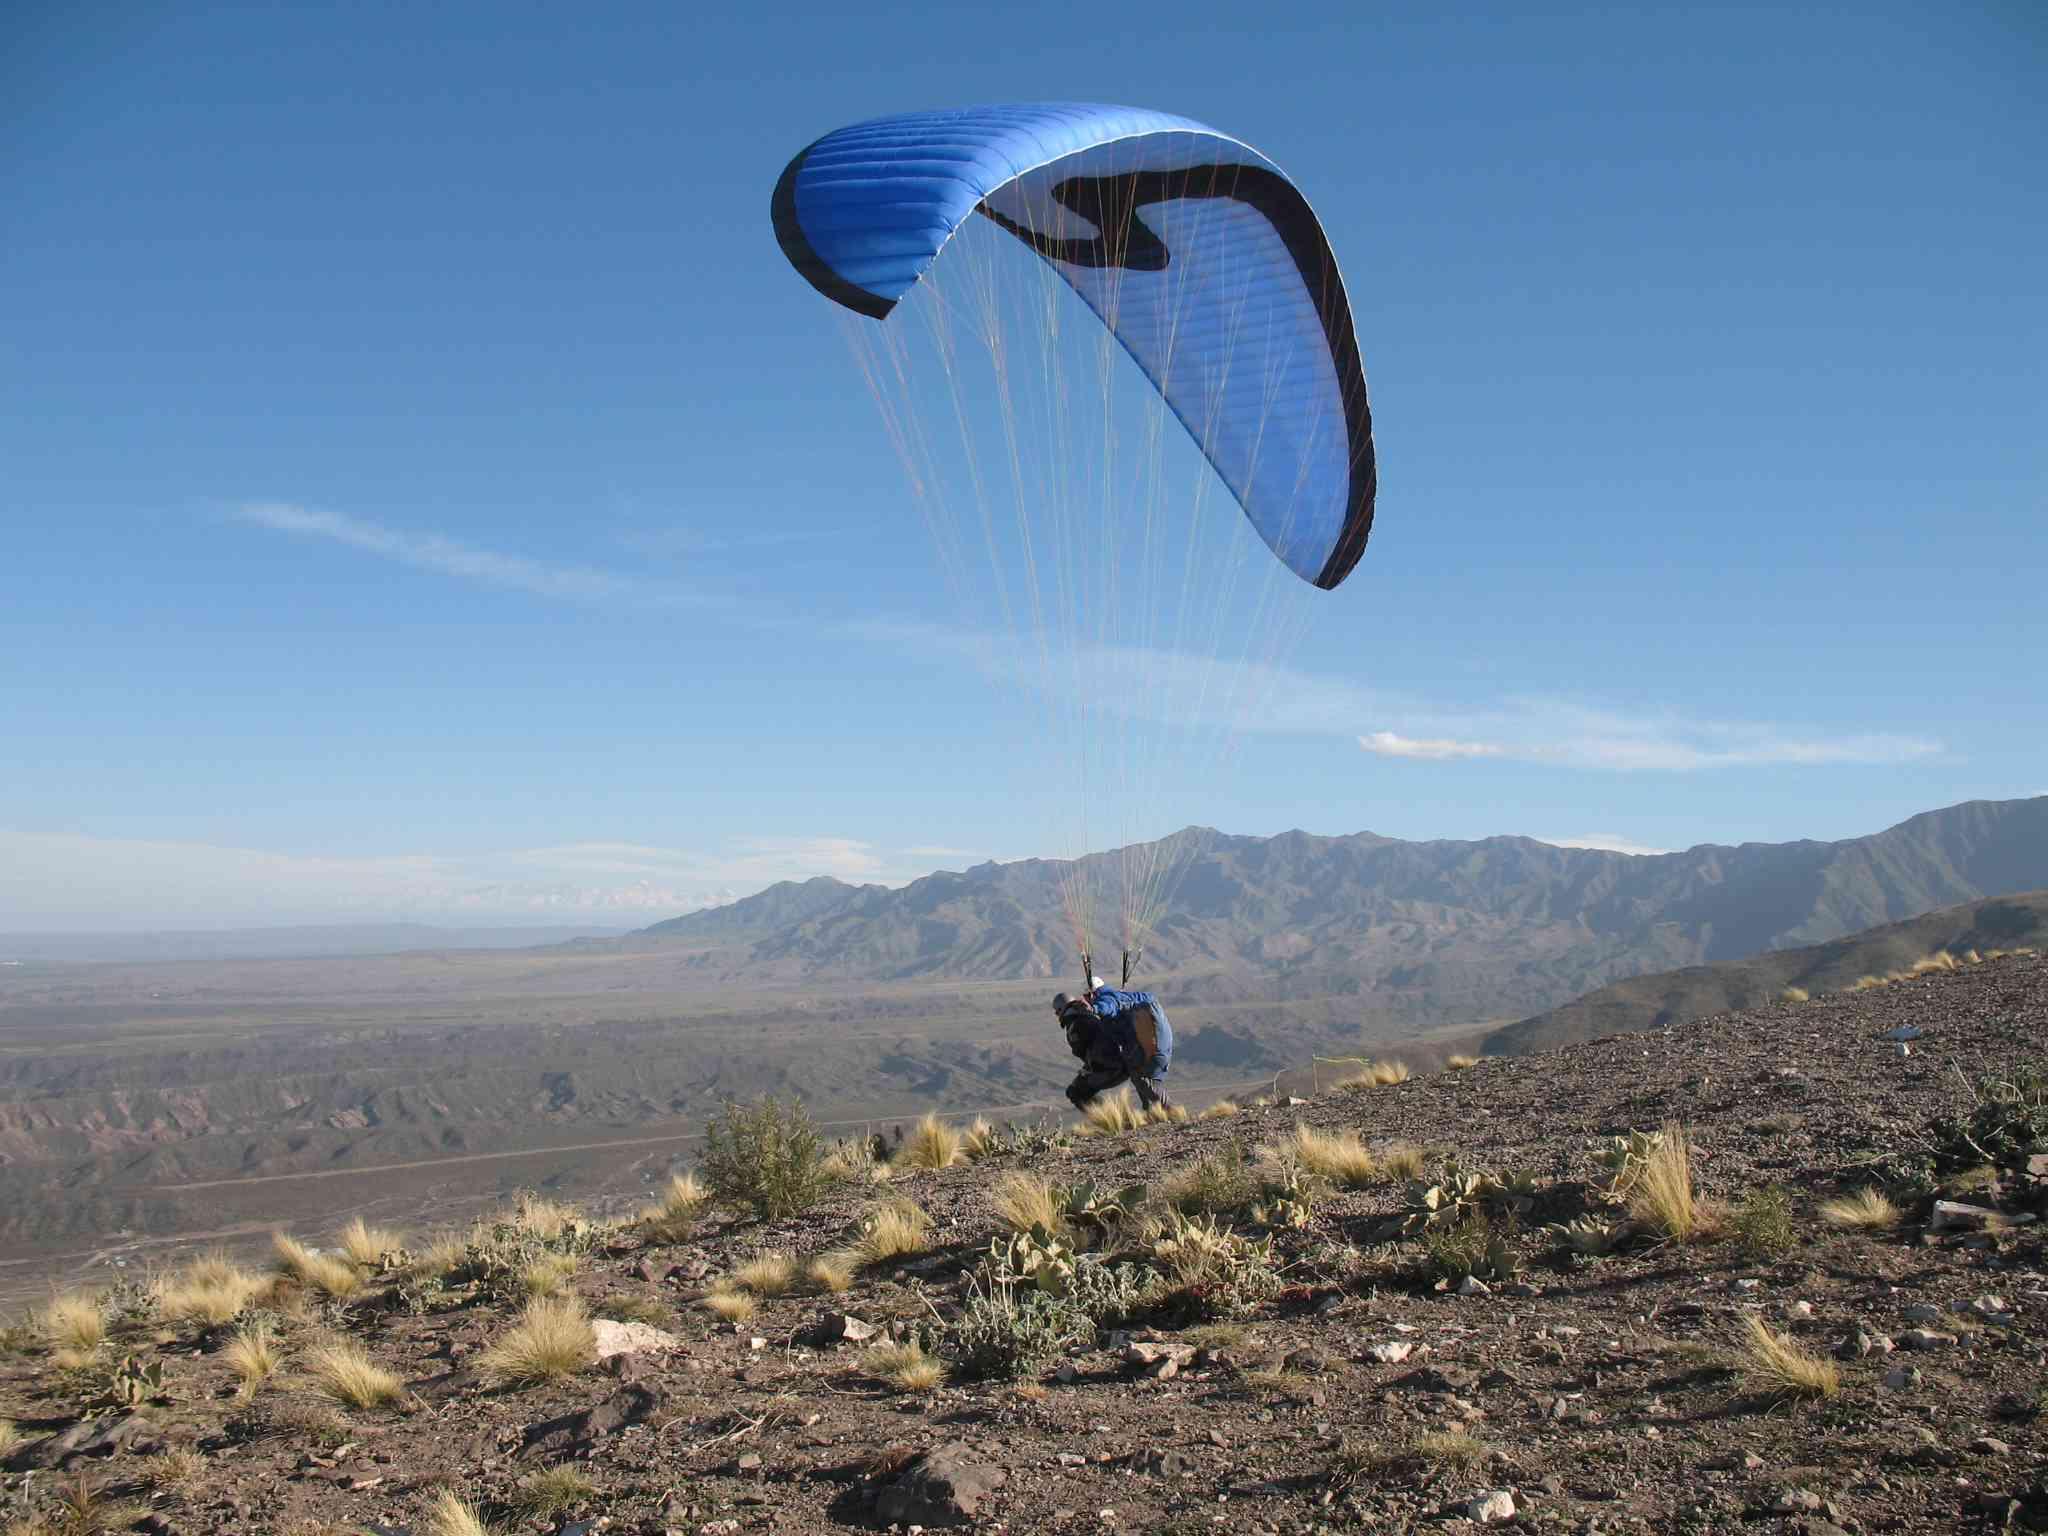 brown mountain landscape with blue paraglider landing